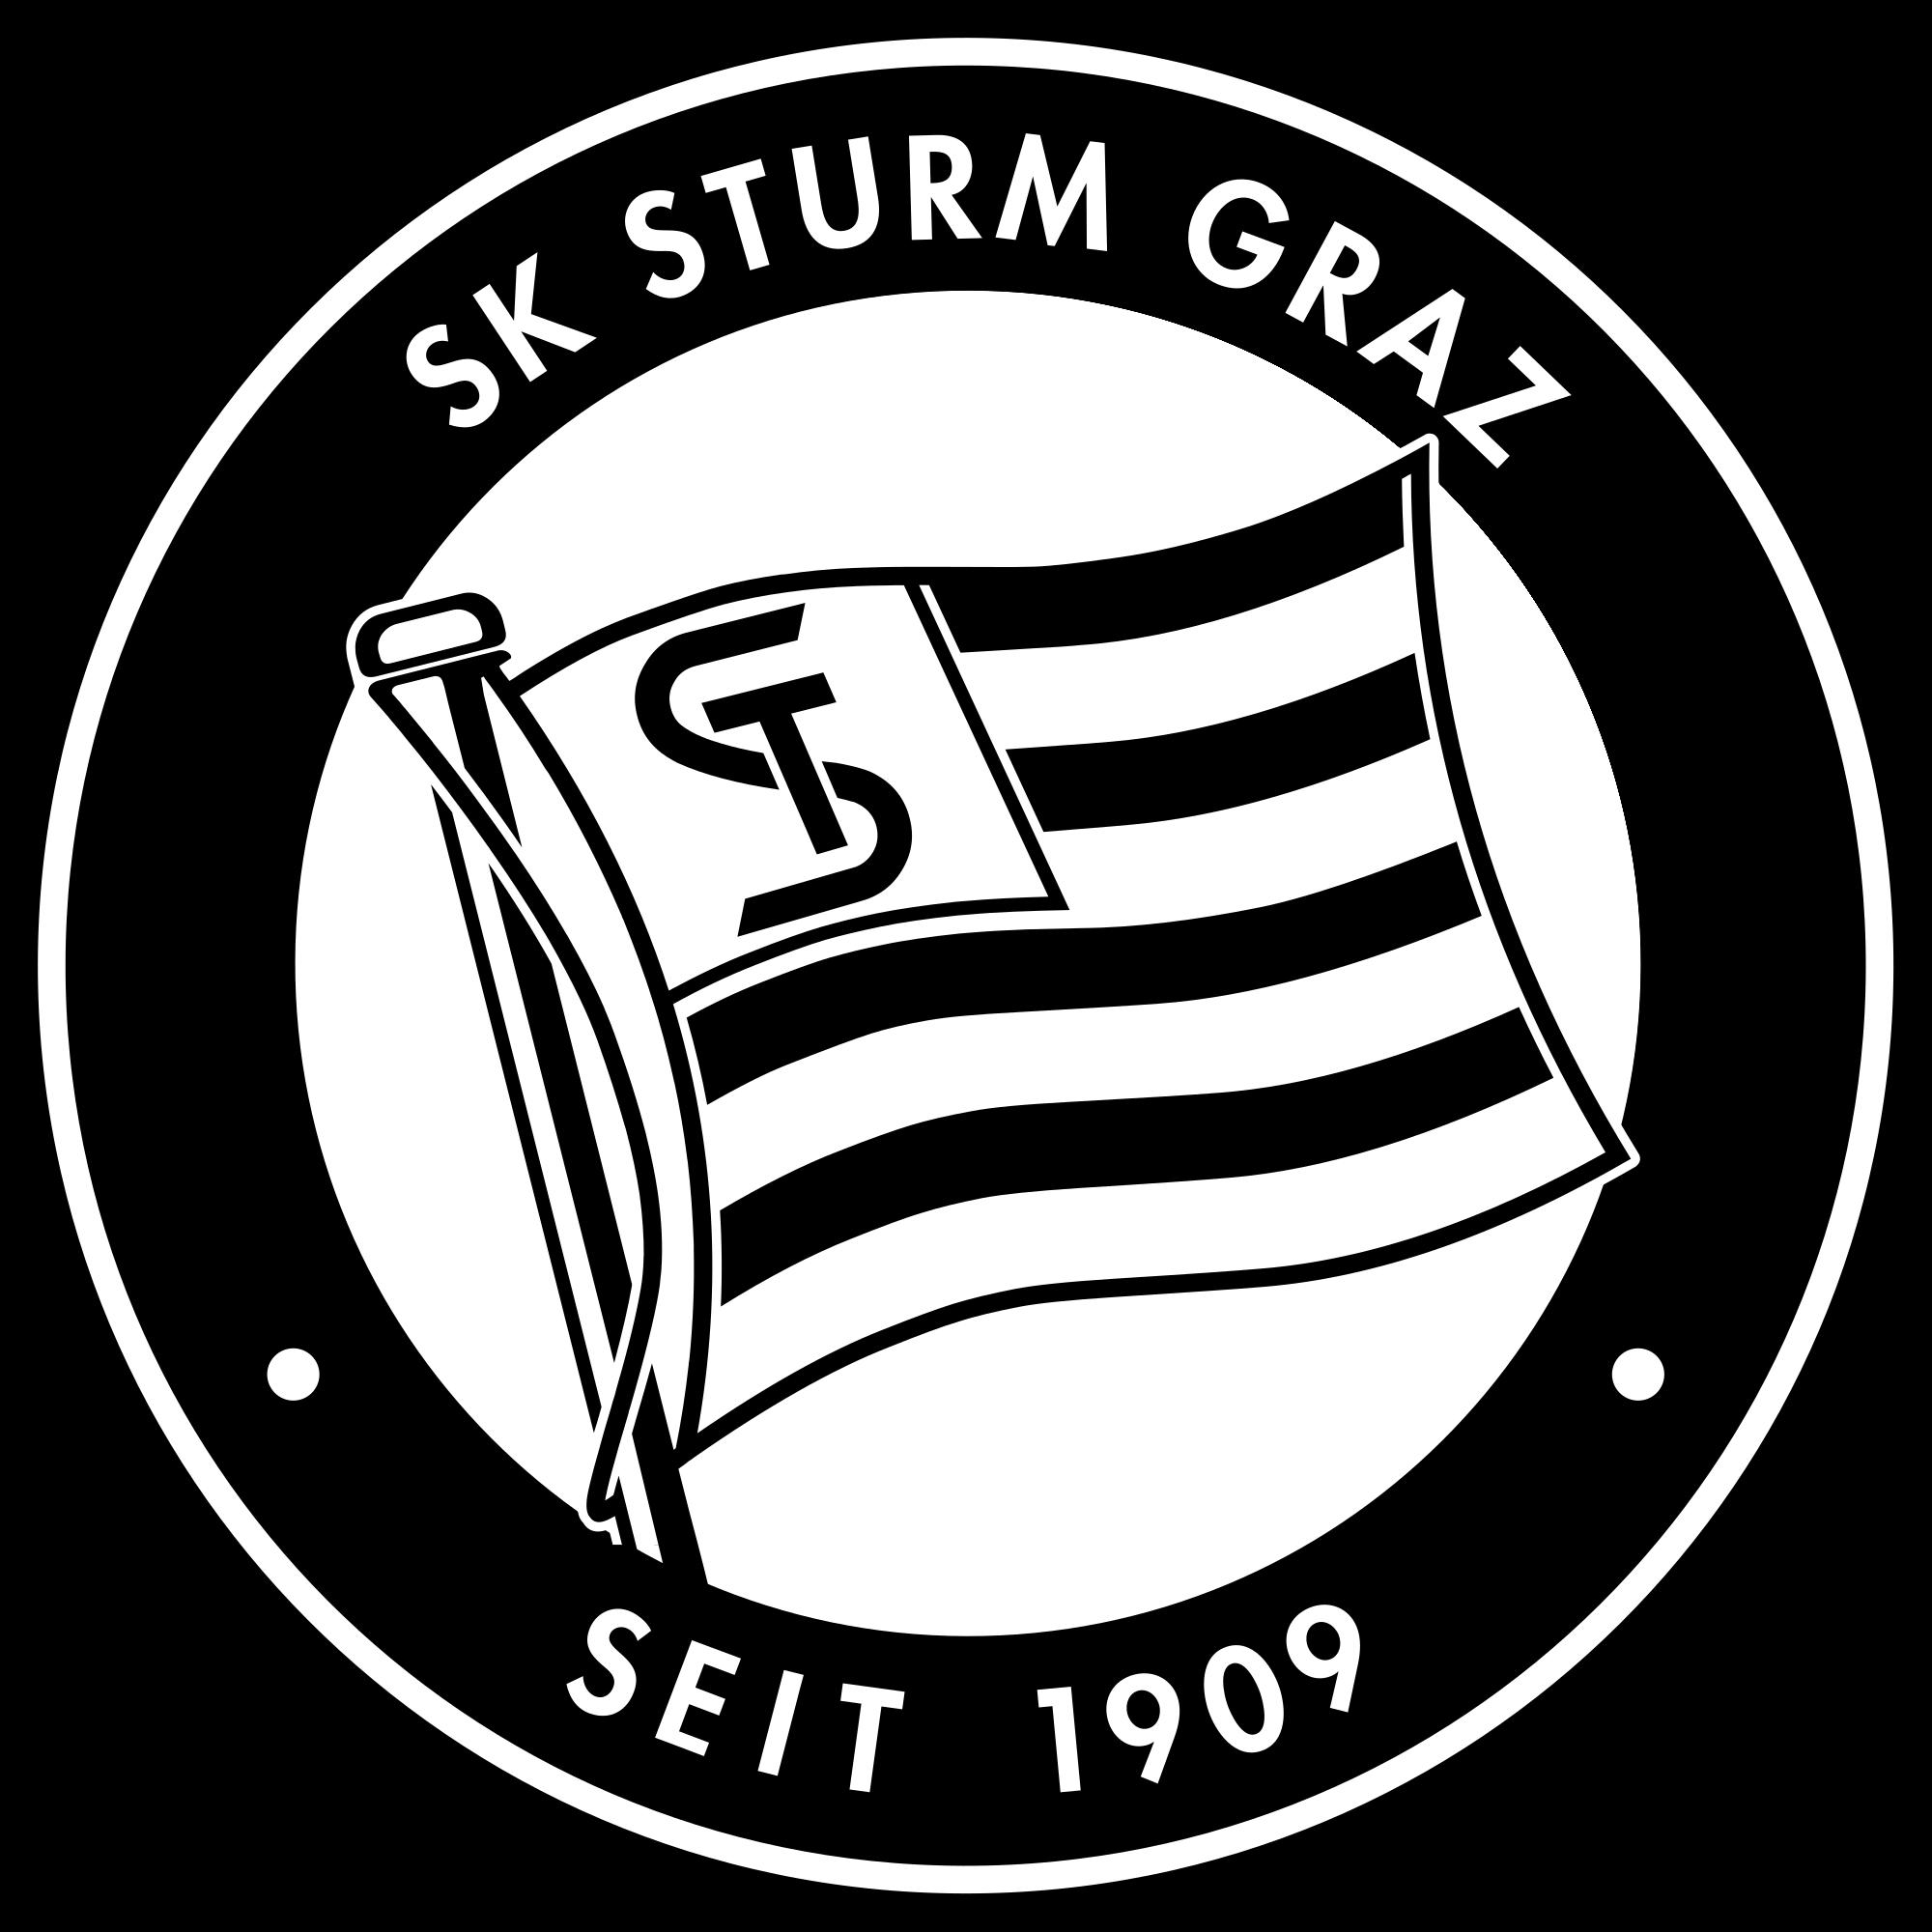 Sturm-2 logo